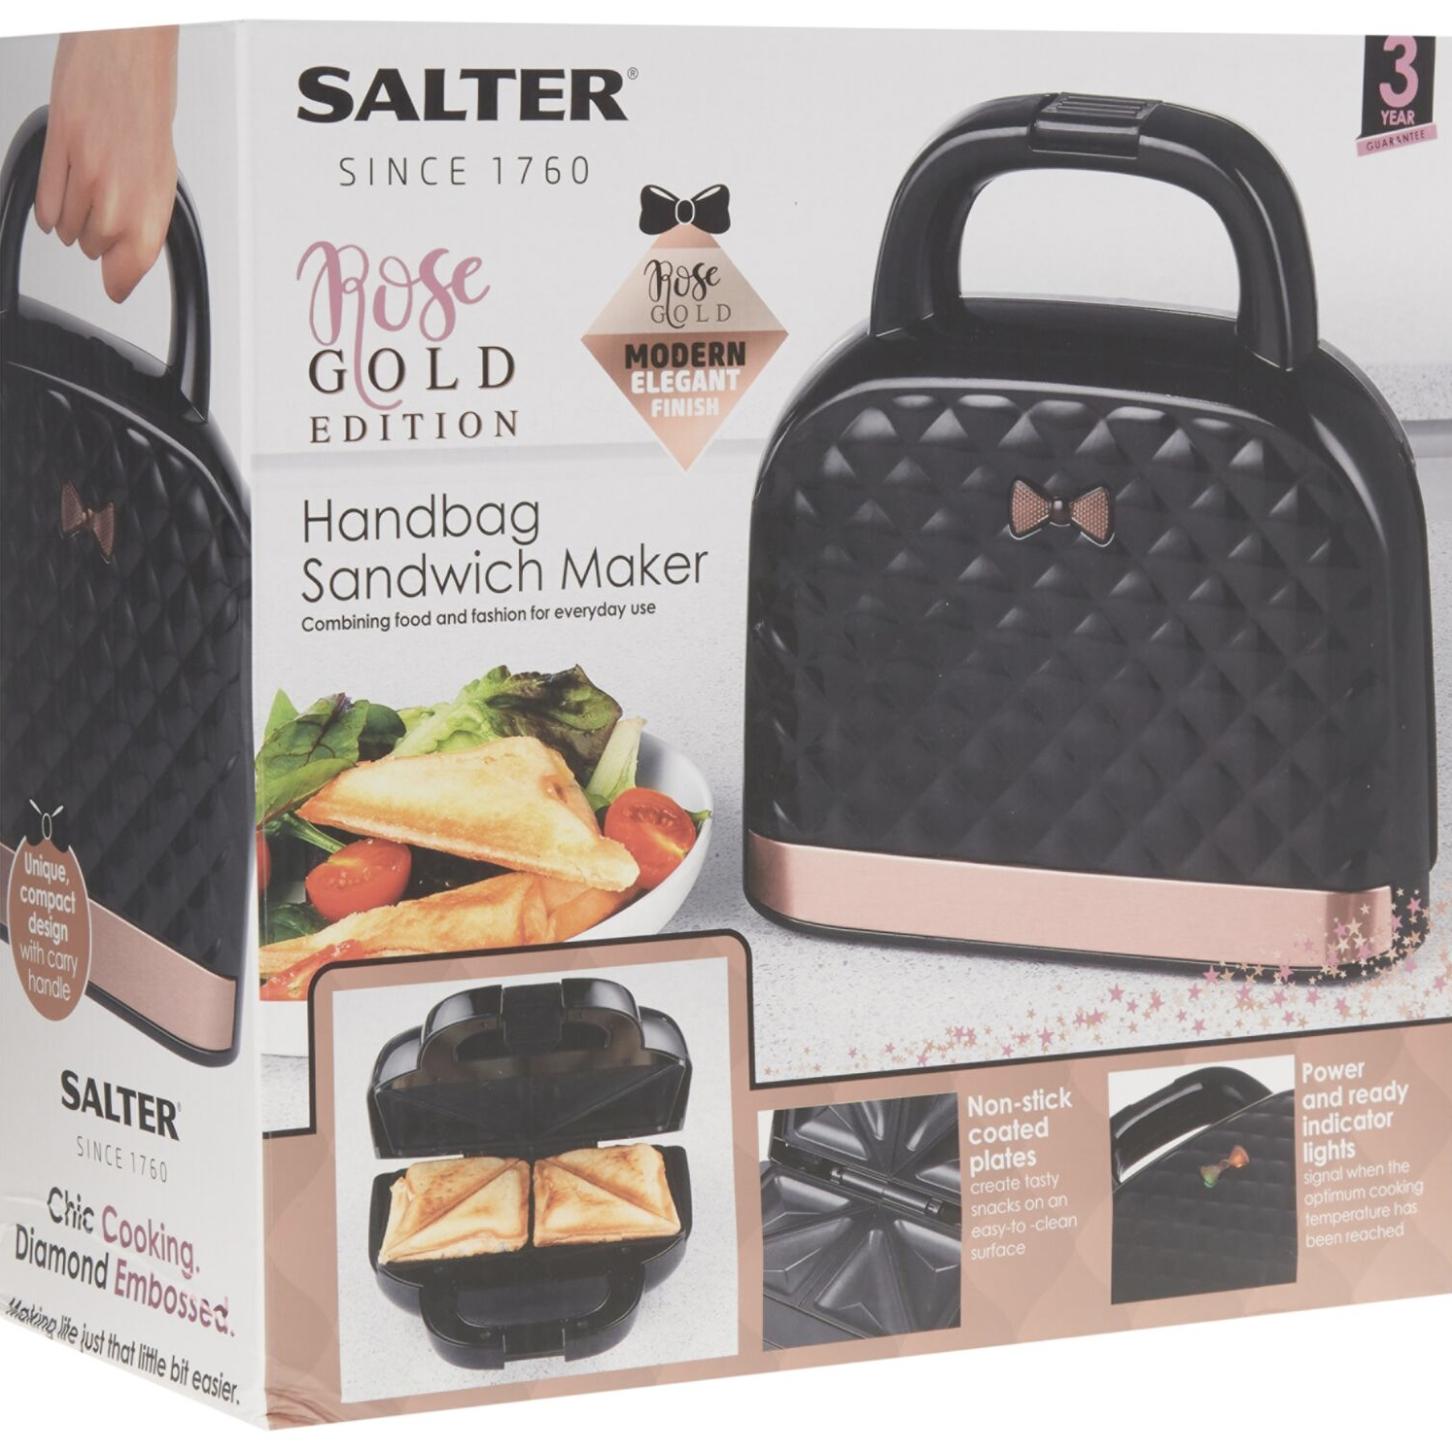 SALTER Black & Rose Gold Handbag Sandwich Maker 22x24cm - £19.99 + £1.99 Click and Collect @ TK Maxx